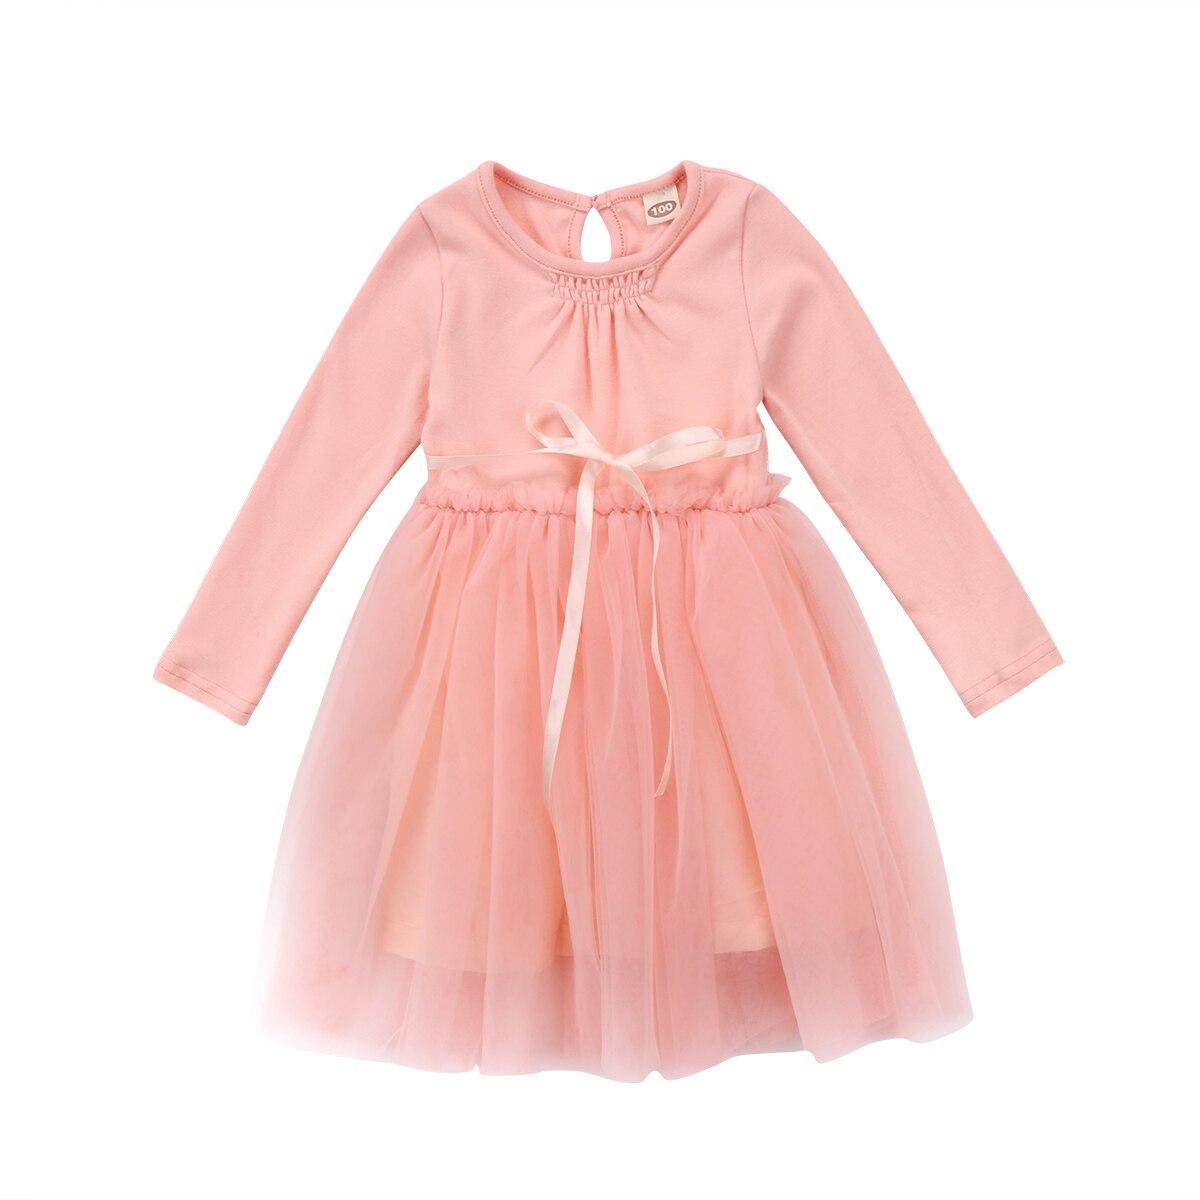 Baby Girls Kids Cloting Dresses Wedding Birthday Long Sleeve Tutu Mini Tiered Prom Princess Party Dress Girl цена 2017